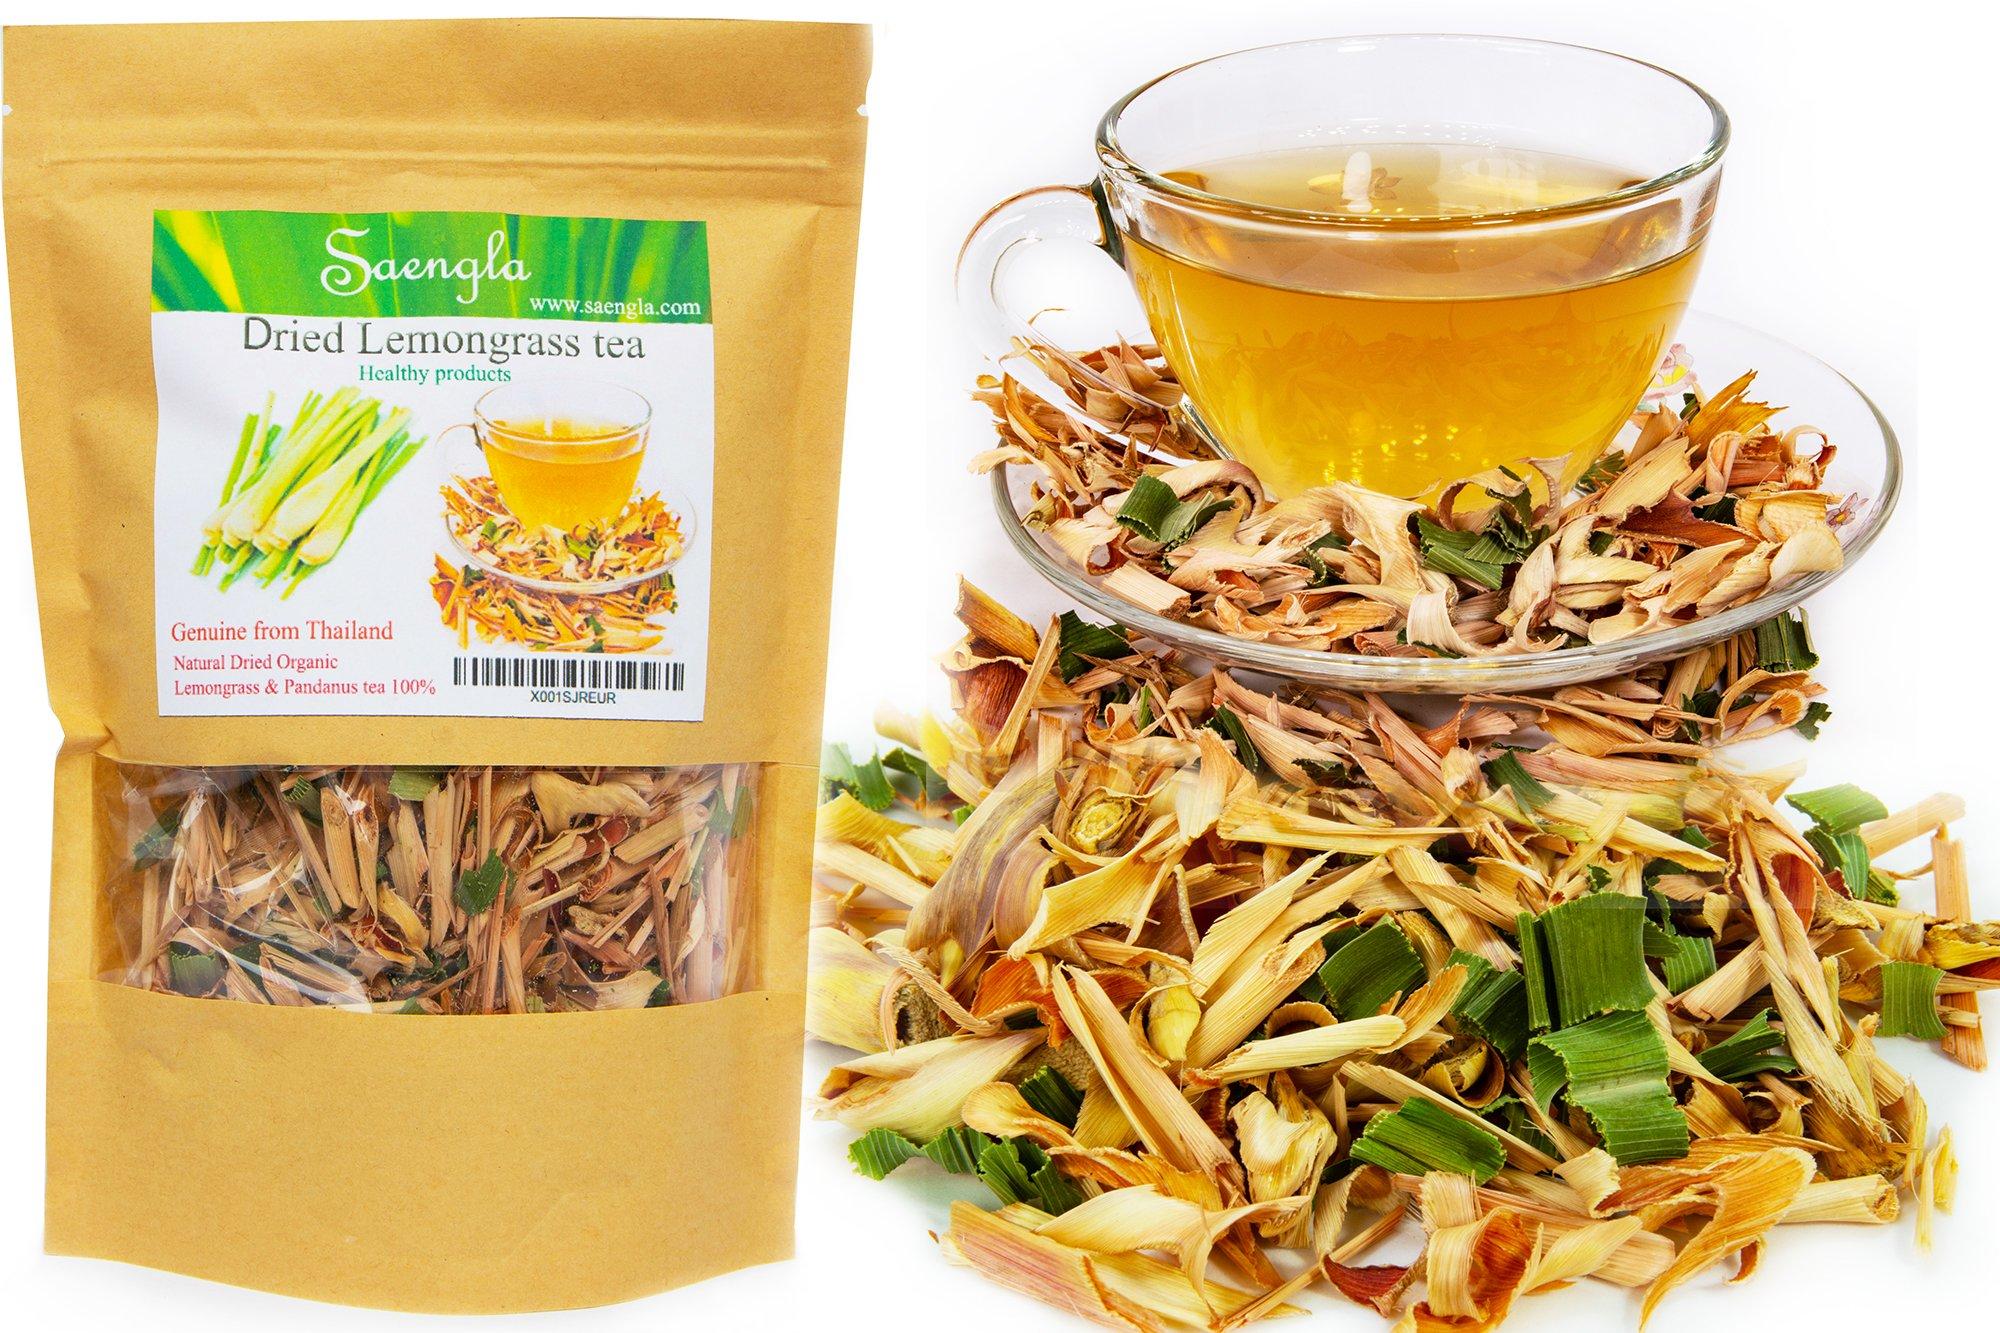 Seangla Organic Dried Lemongrass Tea & Pandan Herb - Fine Cut and Sifted 2.5 Oz